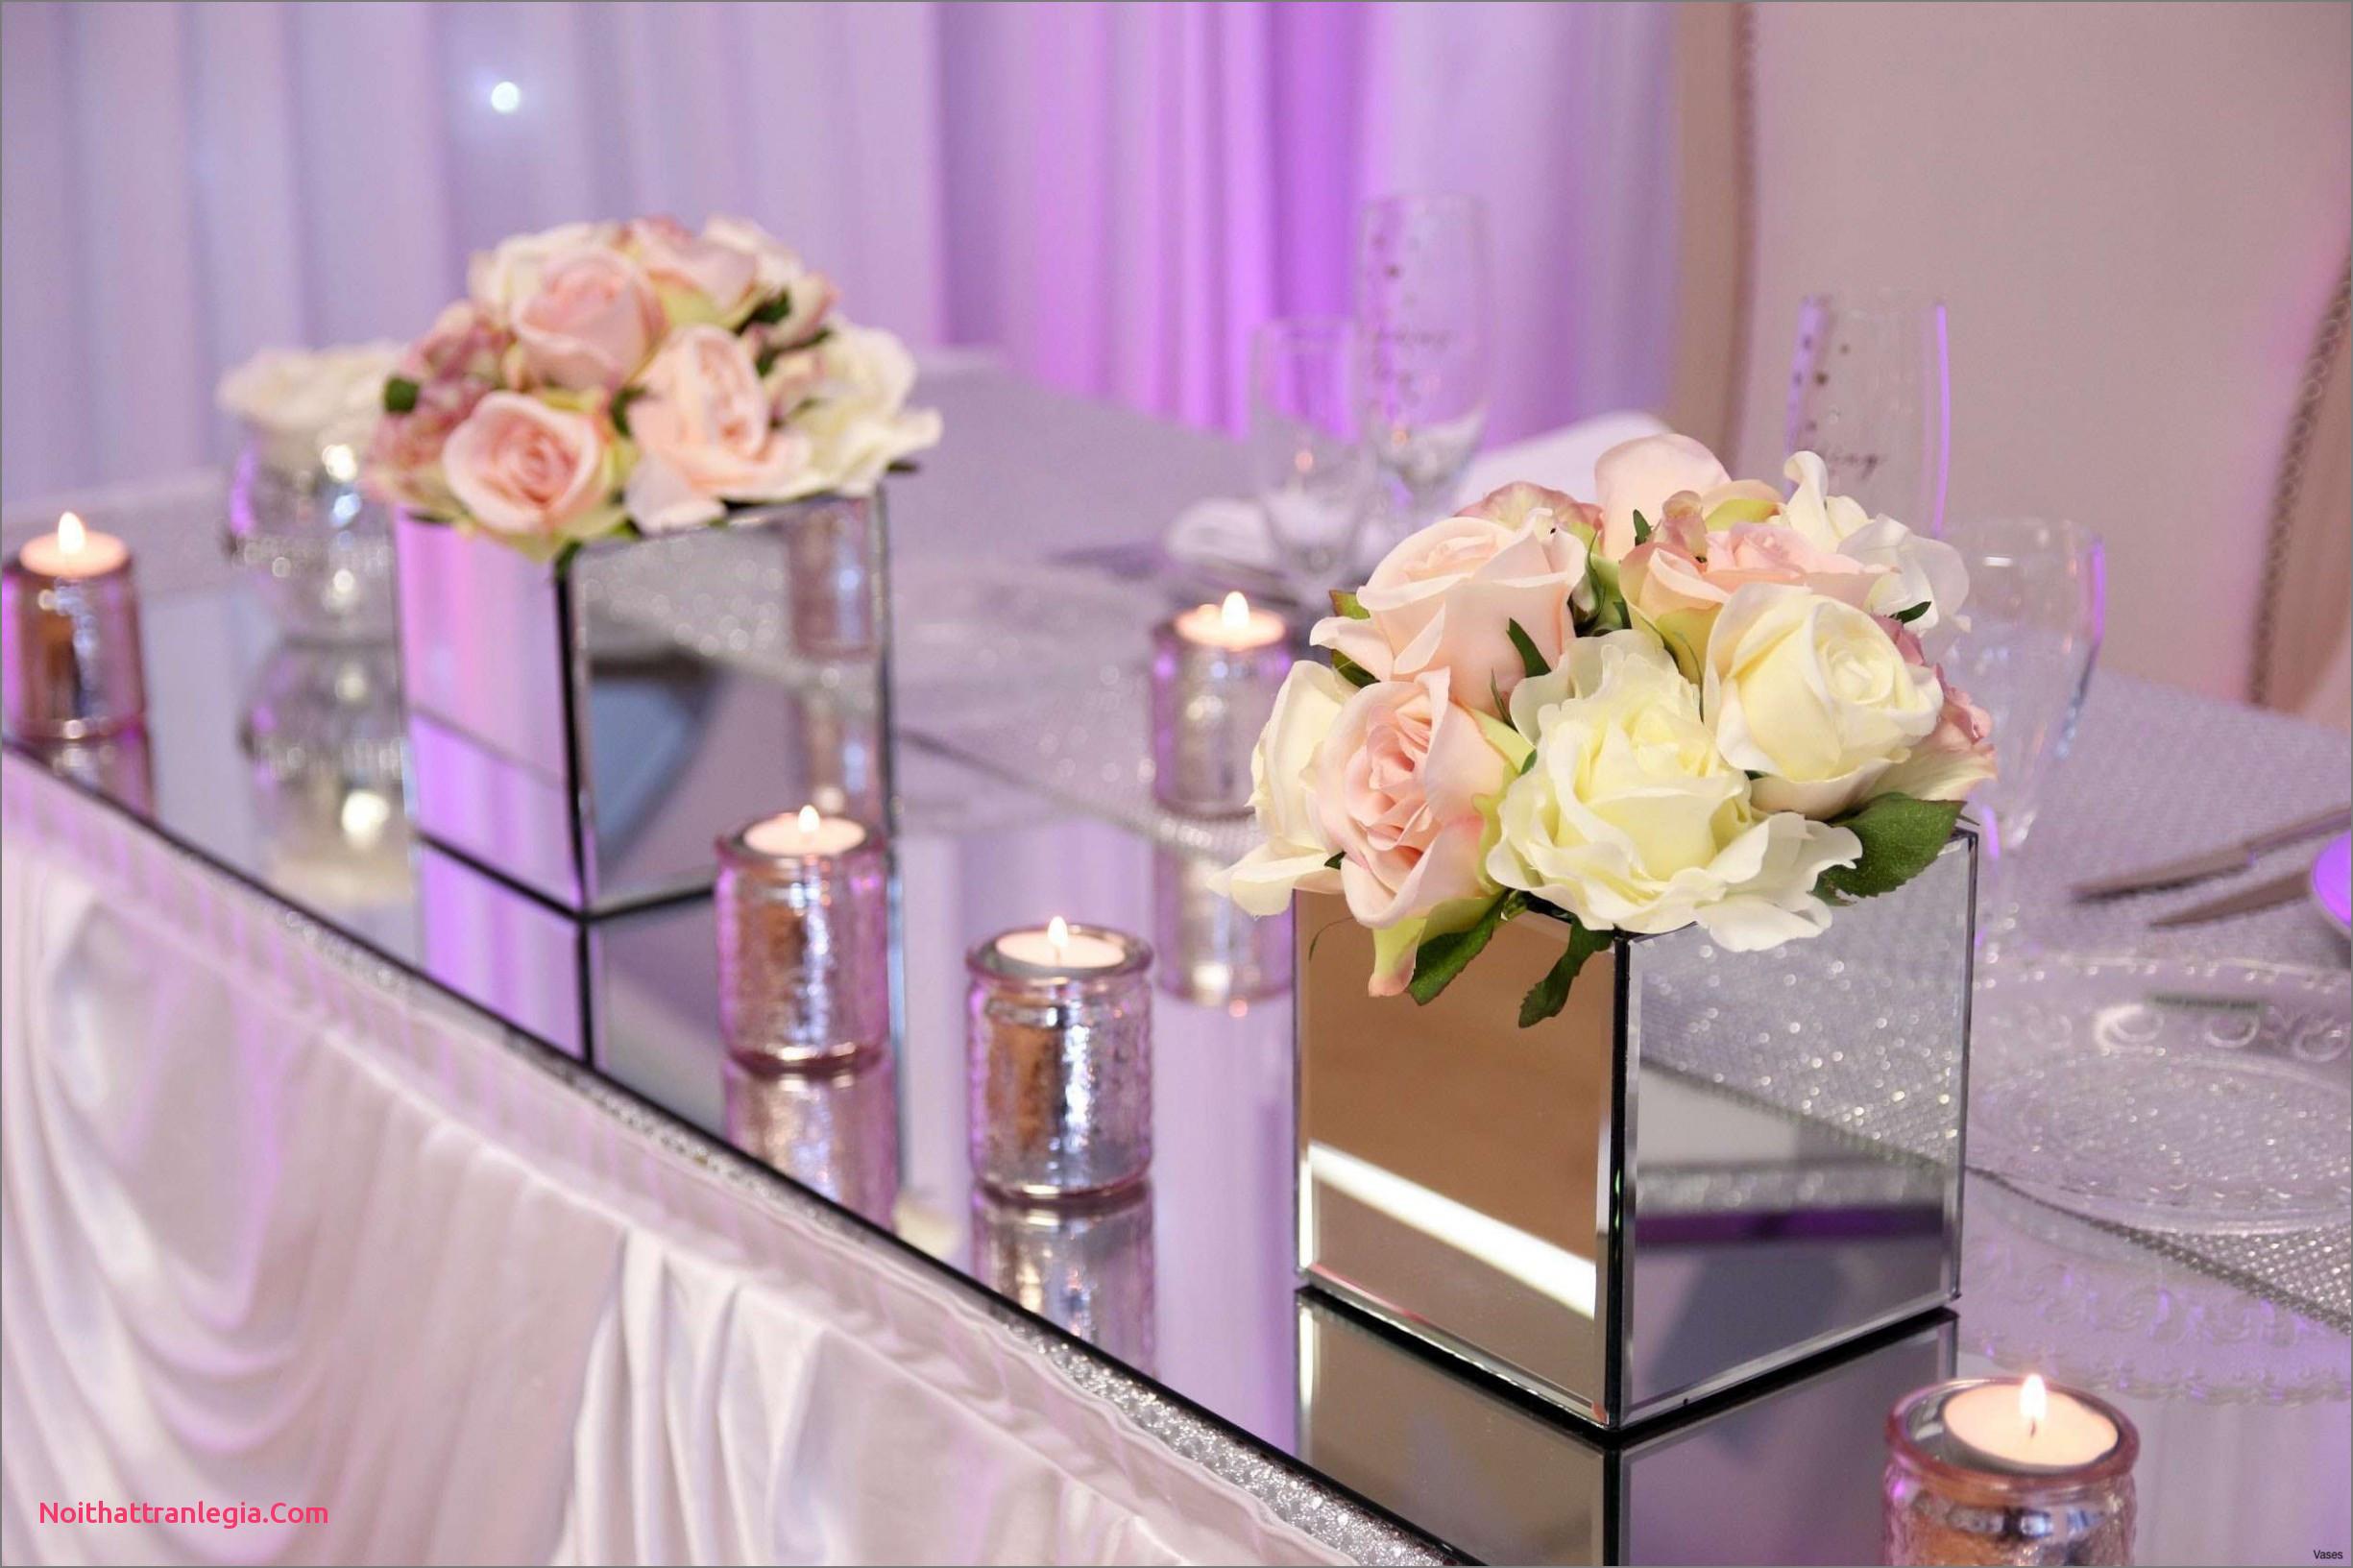 tall glass vase decorating ideas of 20 wedding vases noithattranlegia vases design intended for mirrored square vase 3h vases mirror table decorationi 0d weddings